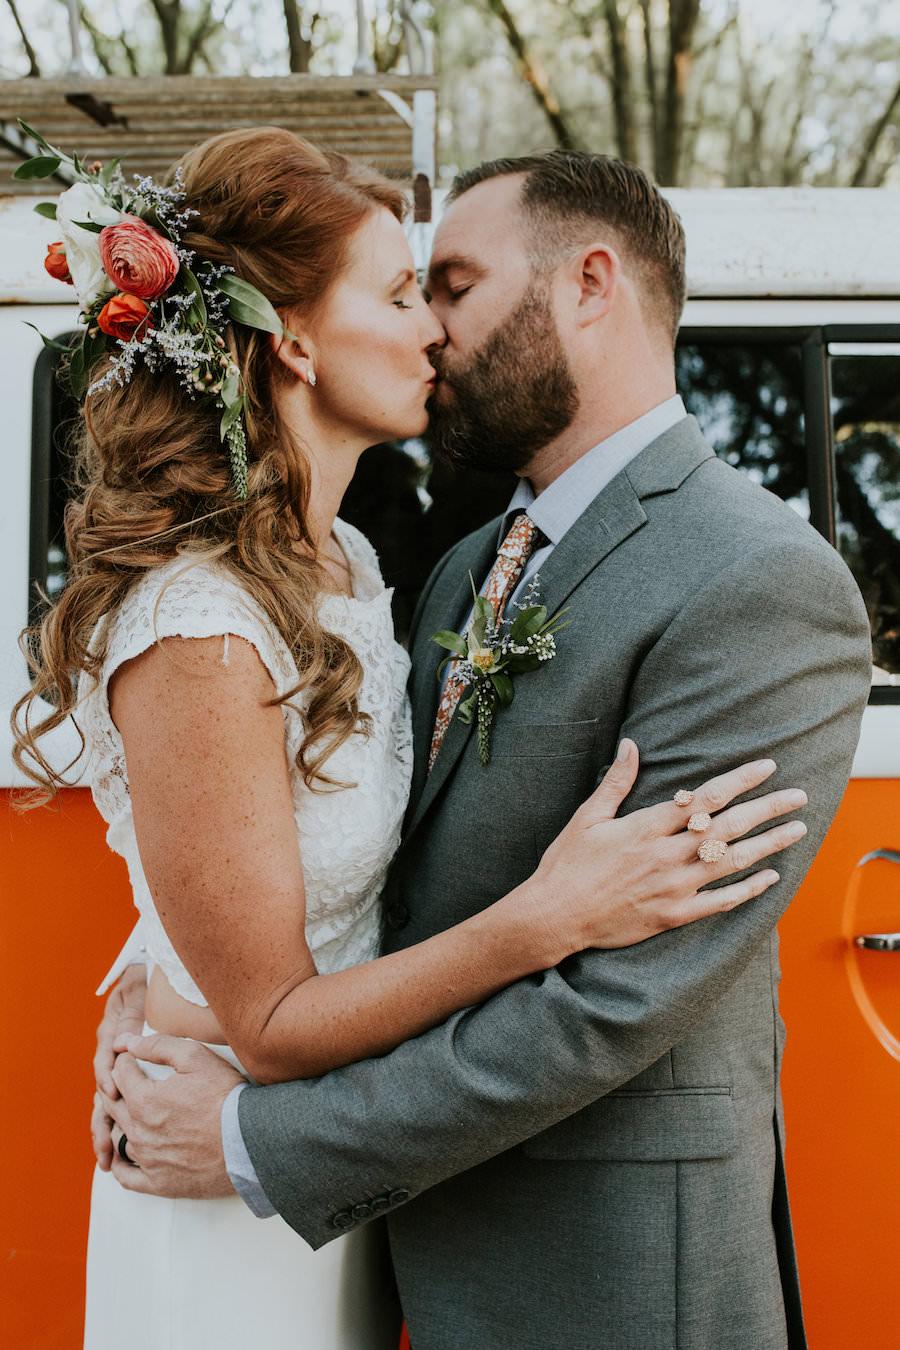 Bride and Groom Wedding Portrait with Orange VW Bus   Retro Vintage Boho Wedding Inspiration   Planner Glitz Events   Outdoor Venue Casa Lantana